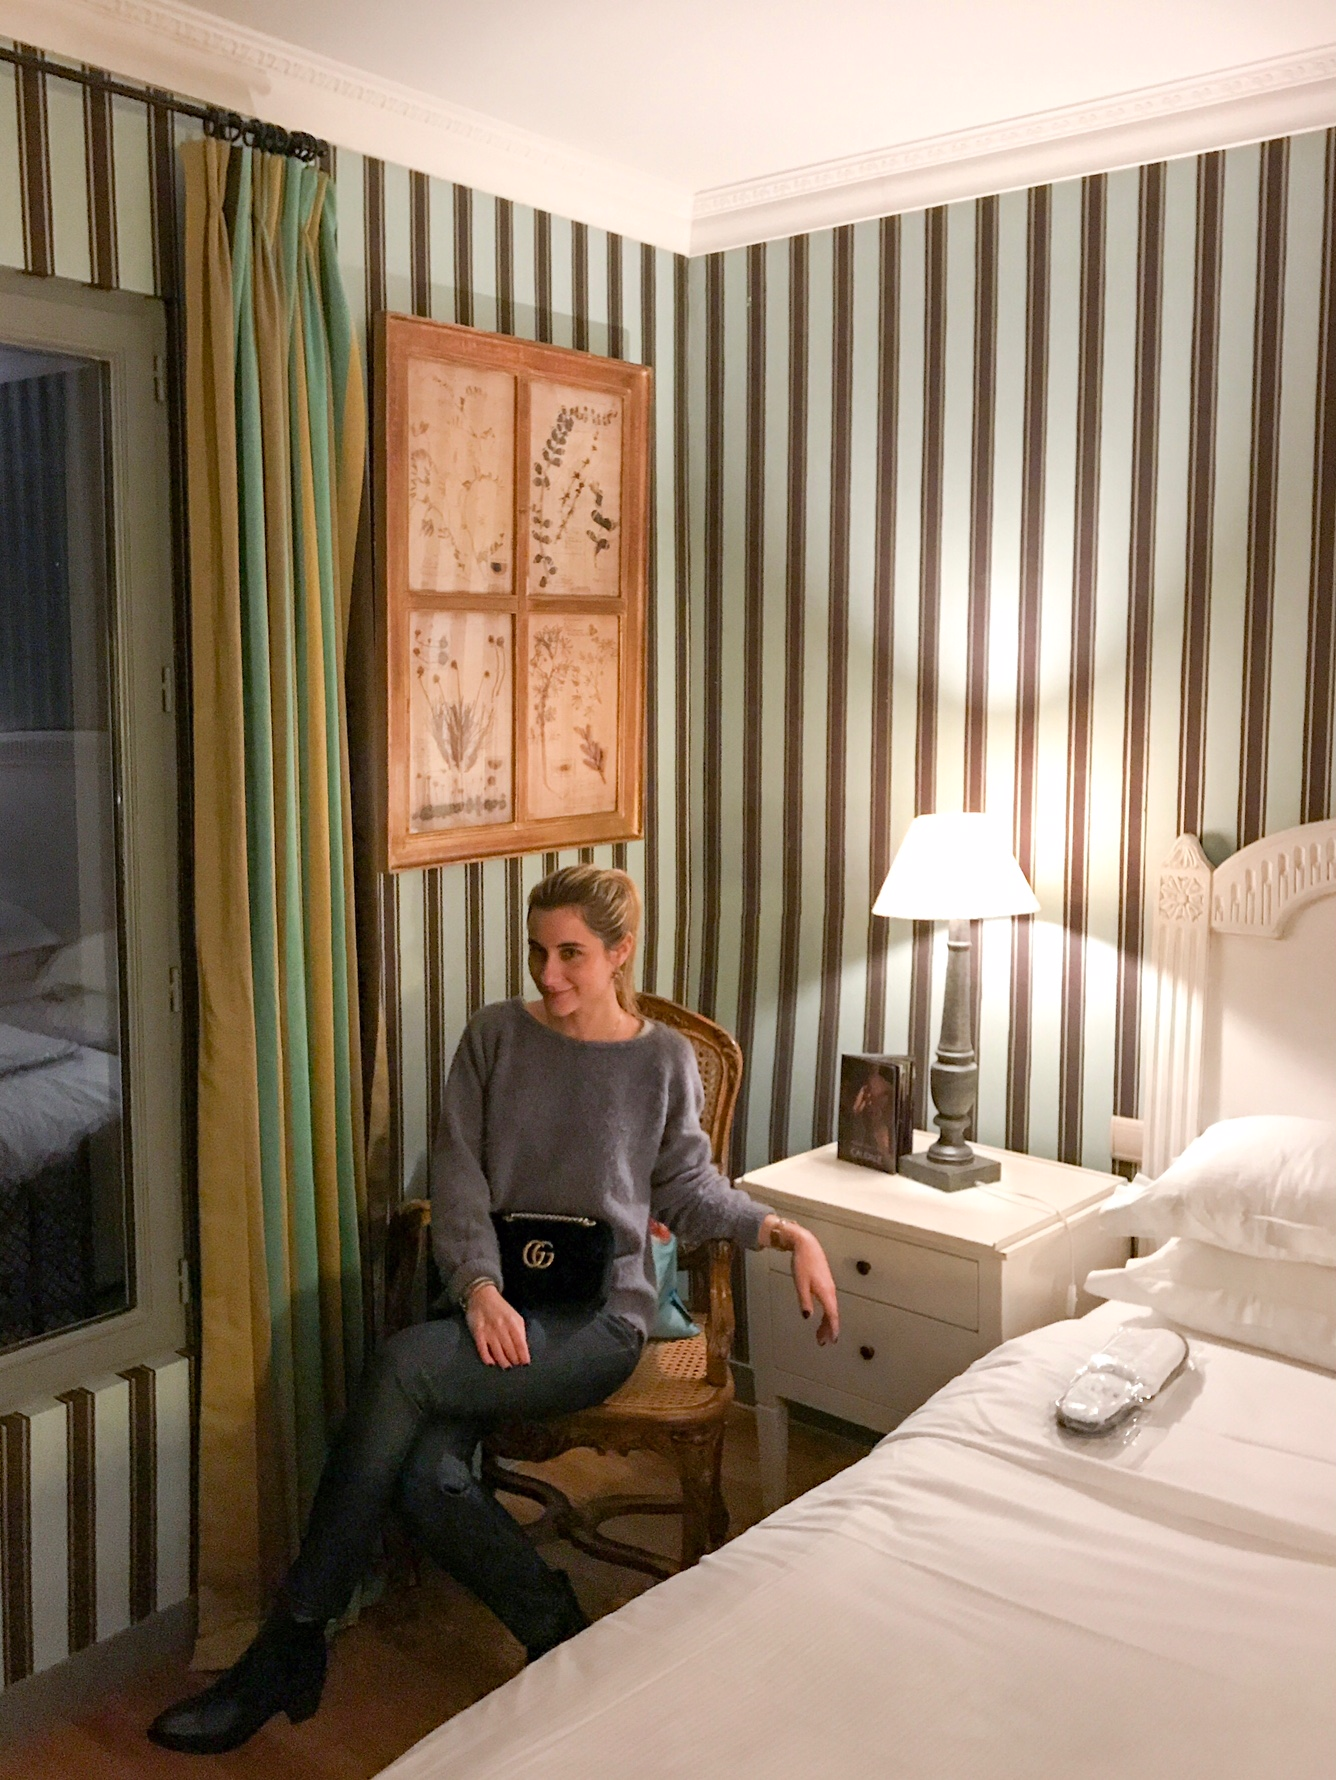 Les étangs de corot, blog mode, camille benaroche, blog beauté, lifestyle, travels, mode, streetstyle, blog mode paris